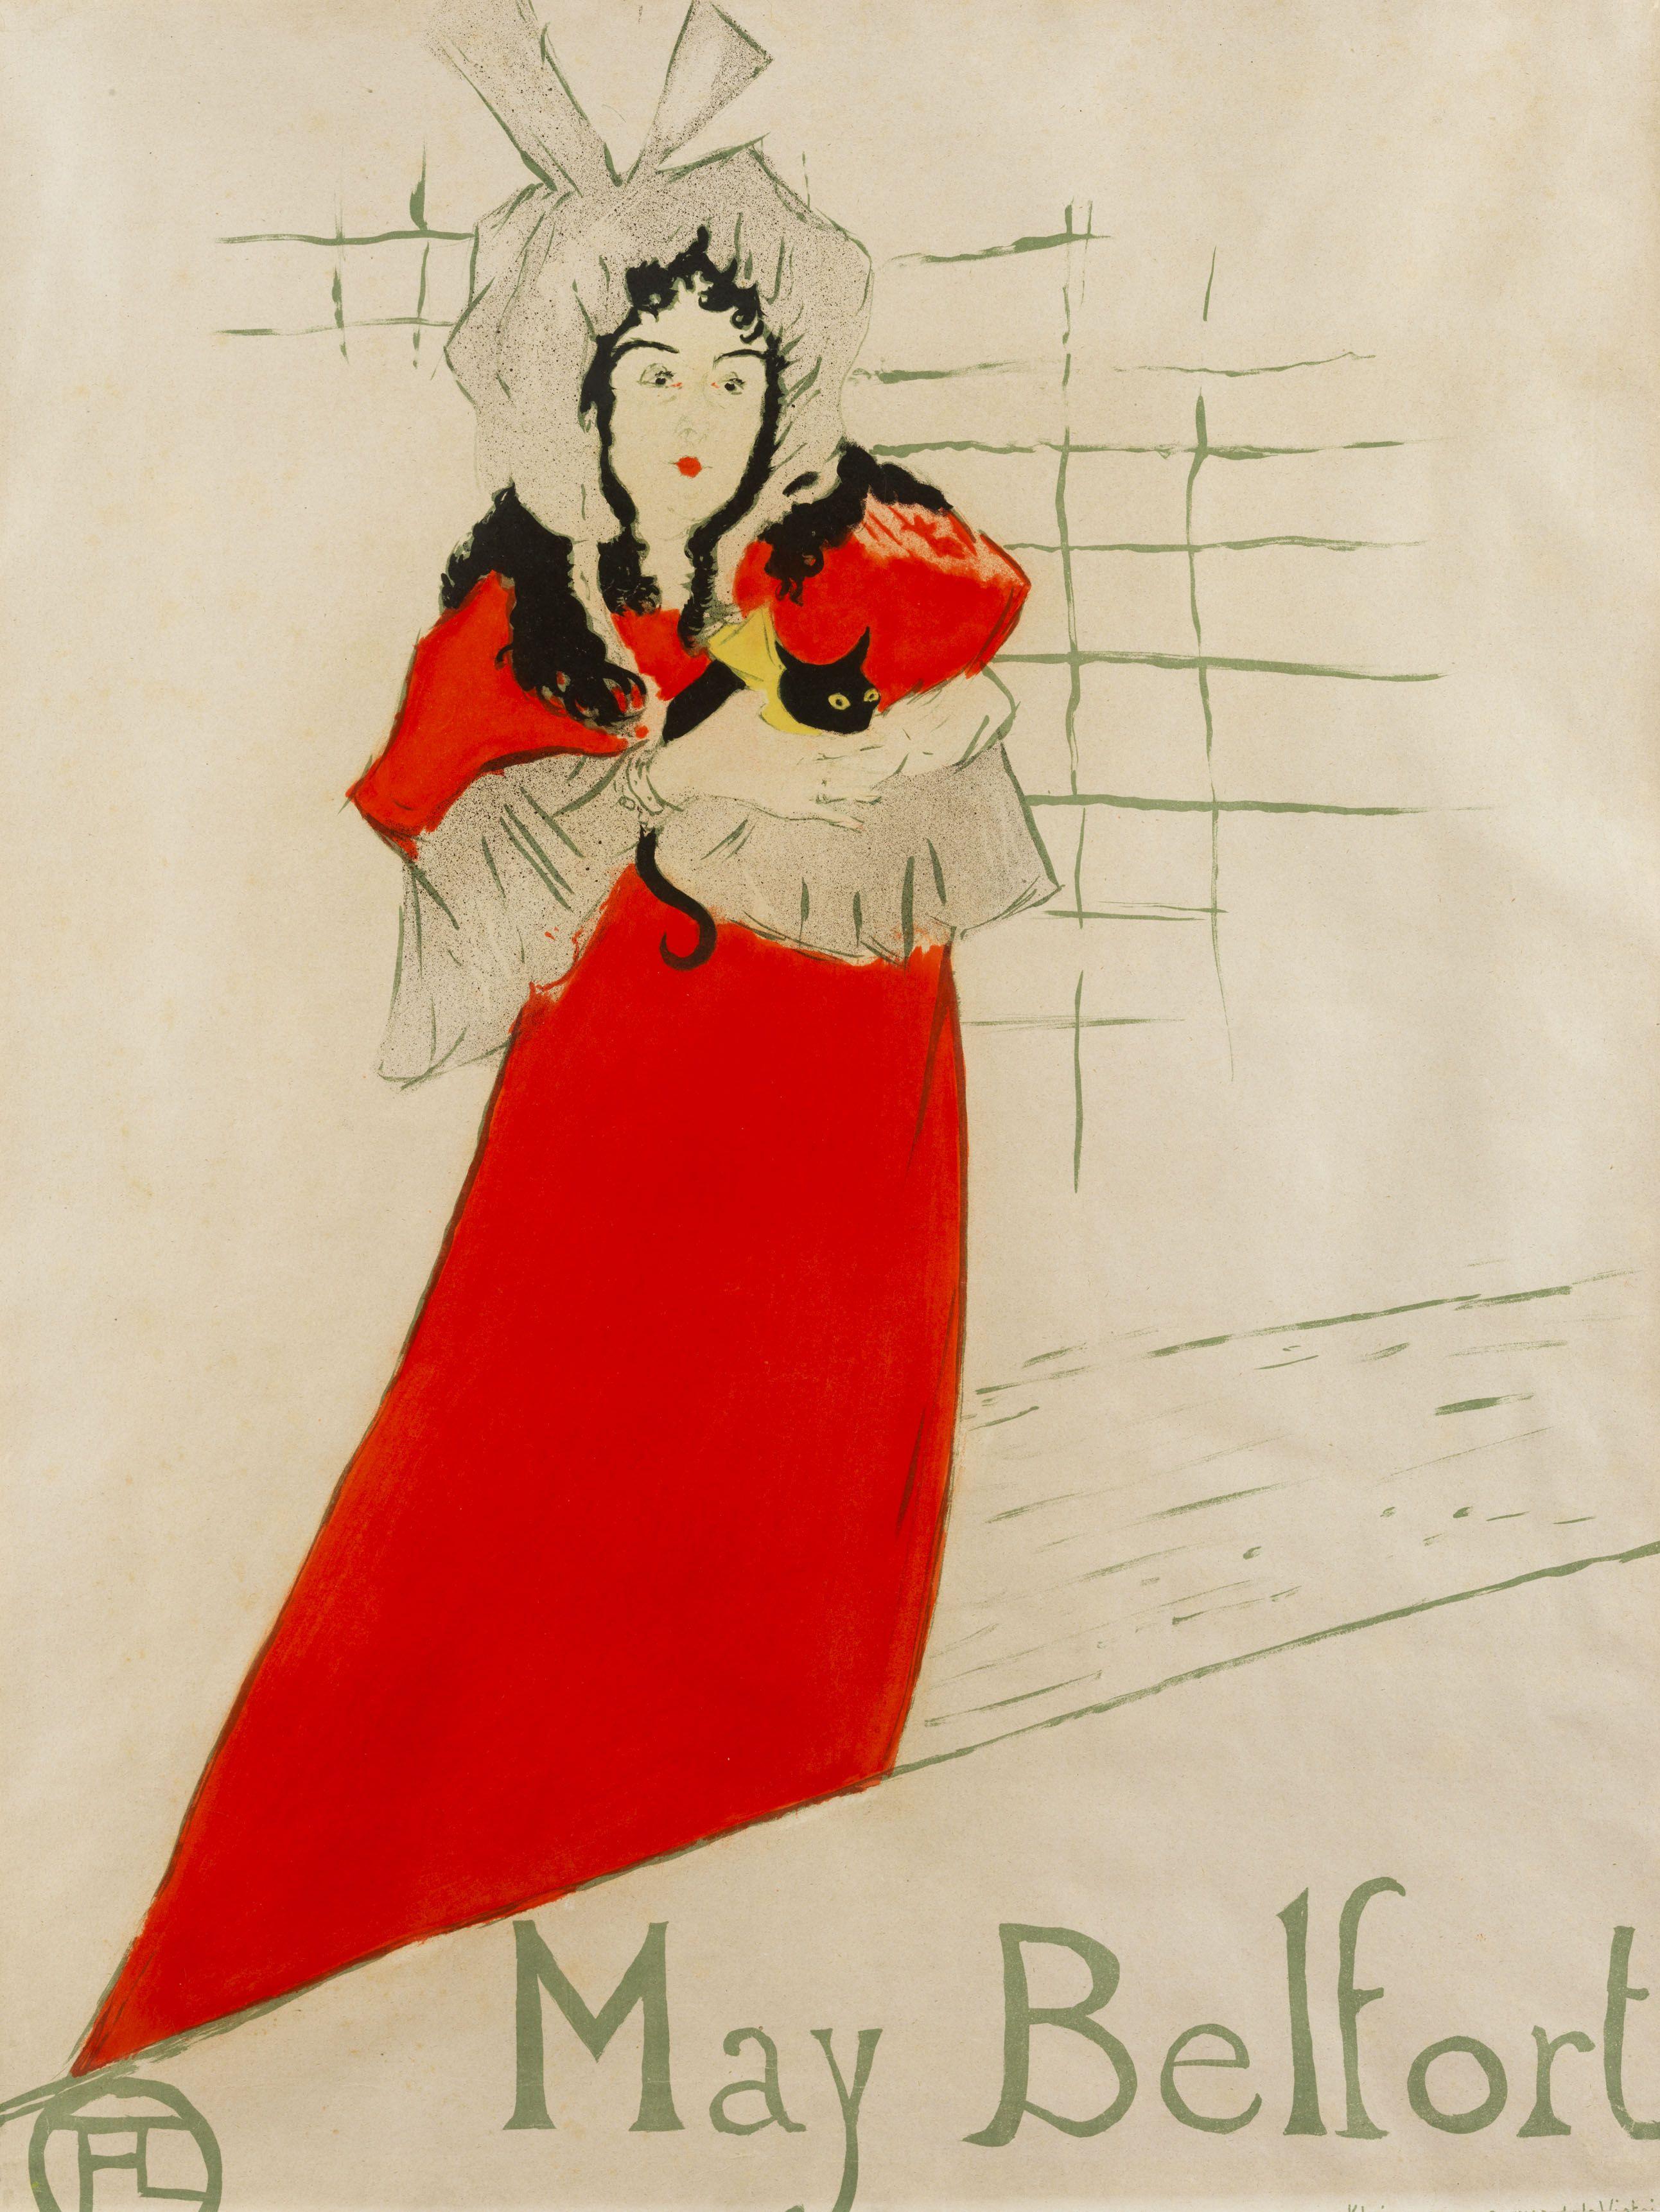 File:Henri de Toulouse-Lautrec May Belfort poster 1895.jpg ...